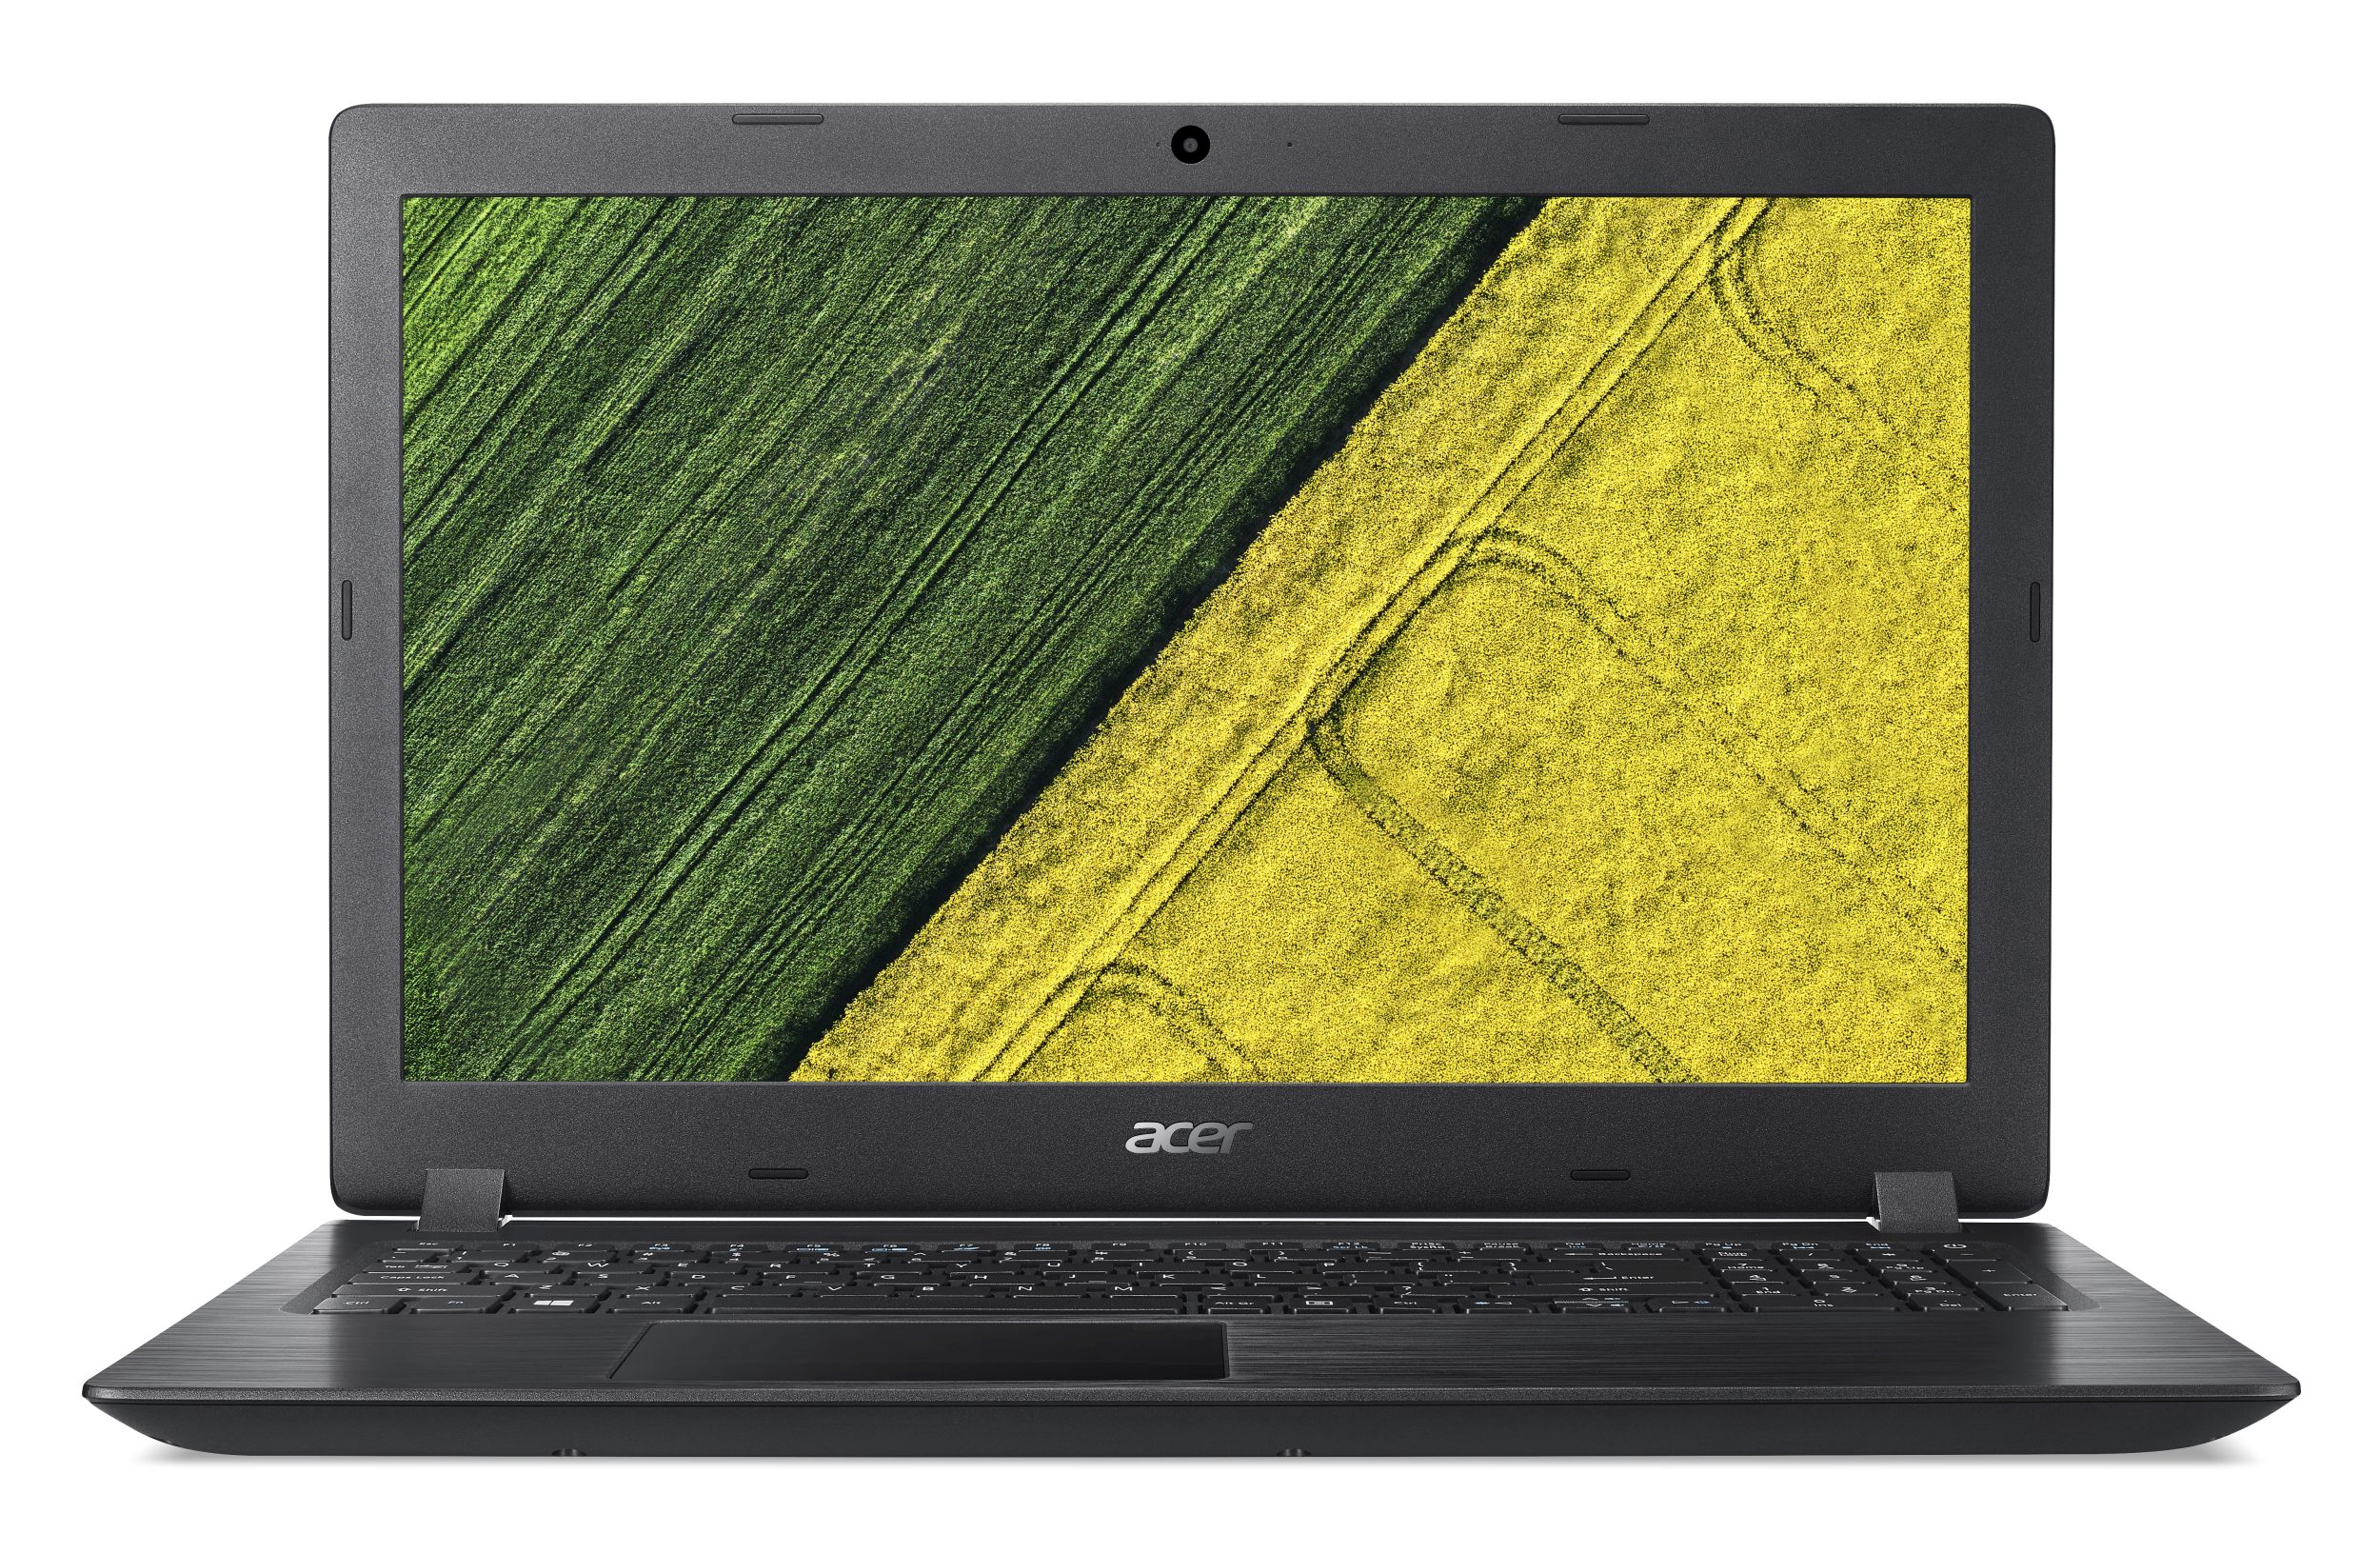 "Acer Aspire 3 (A15-31-C4YJ) Celeron N3350/4GB+N/A/500GB/HD Graphics/15,6"" FHD LED matný/BT/Linux/Black"